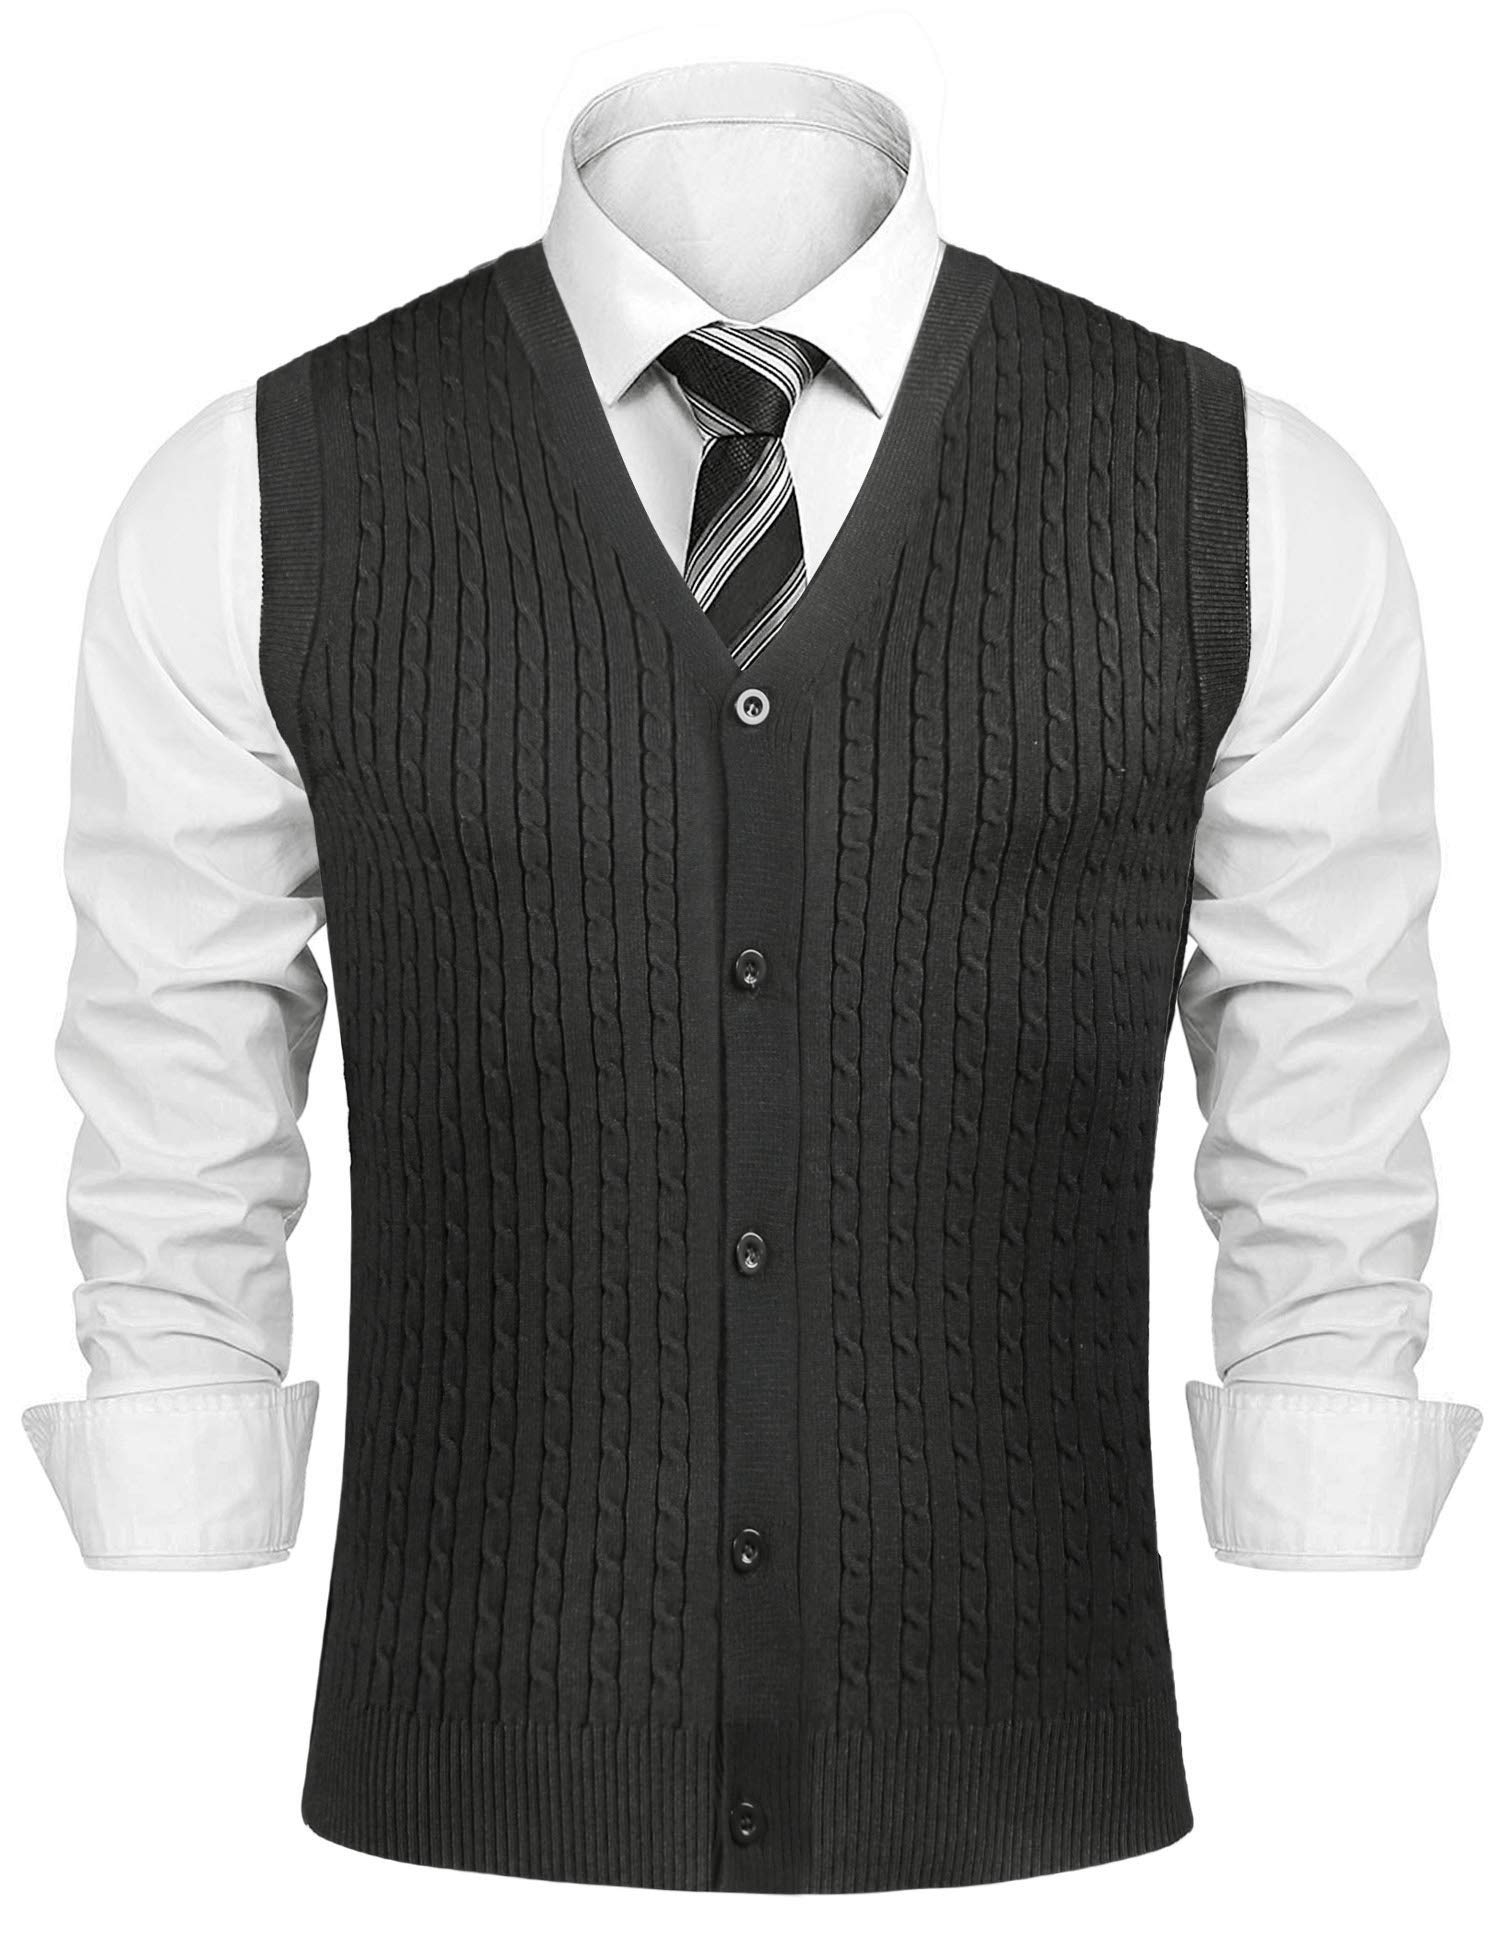 Aibrou Men's V-Neck Button Front Sweater Vest with Twist Cable (L,Dark Grey) by Aibrou